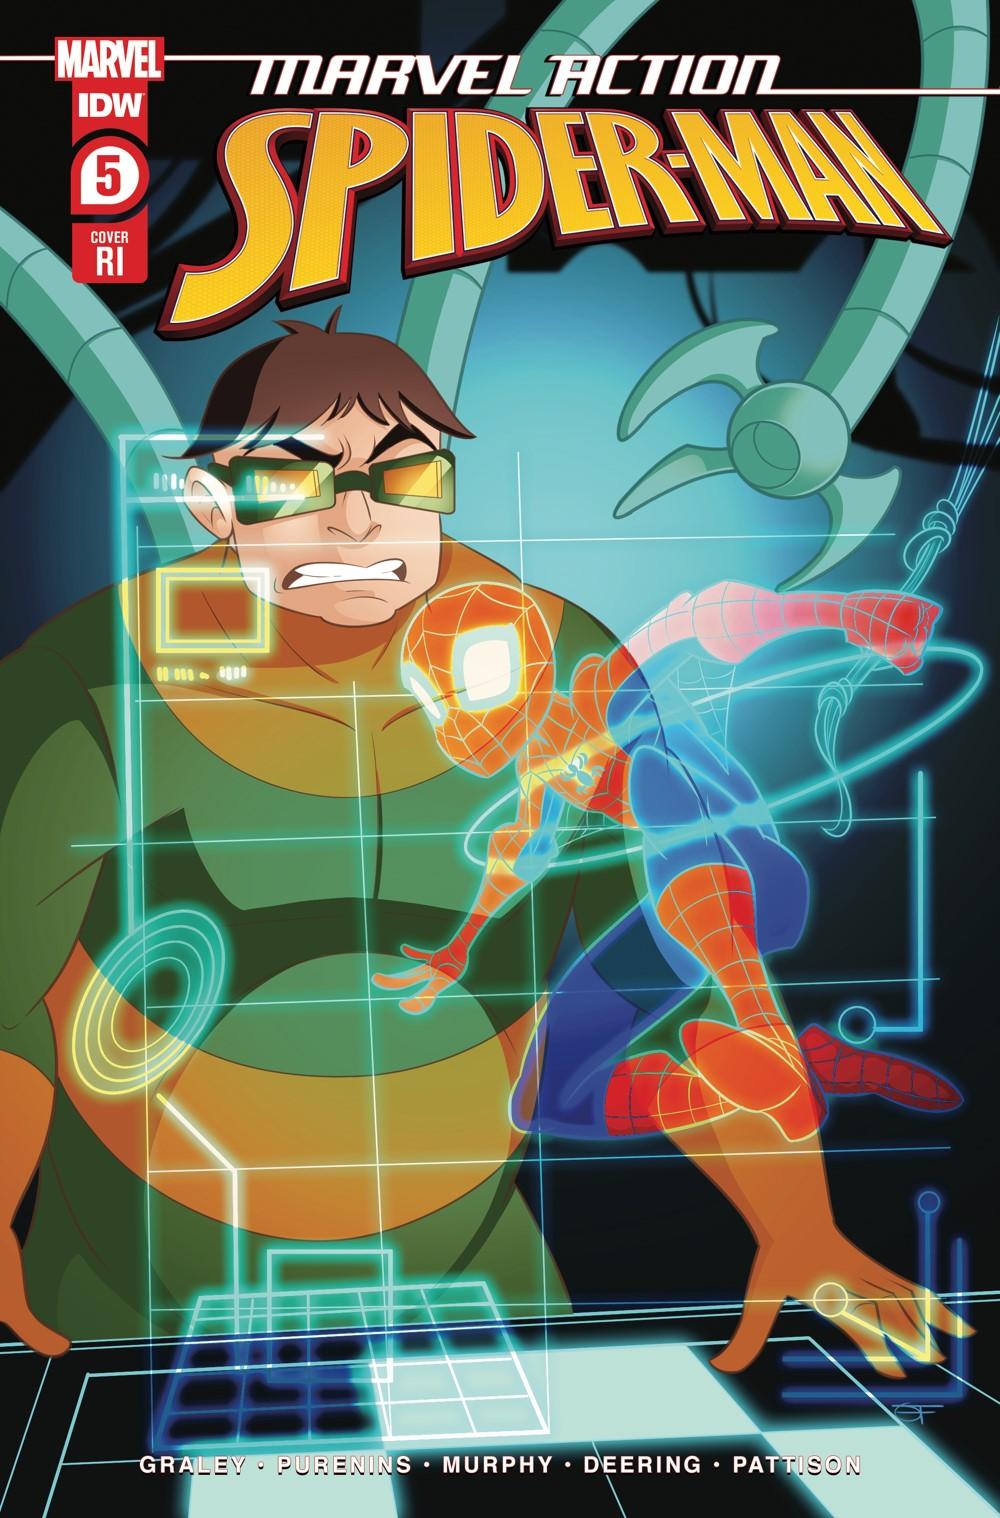 SpidermanV3-05_cvrRI ComicList: IDW Publishing New Releases for 09/22/2021